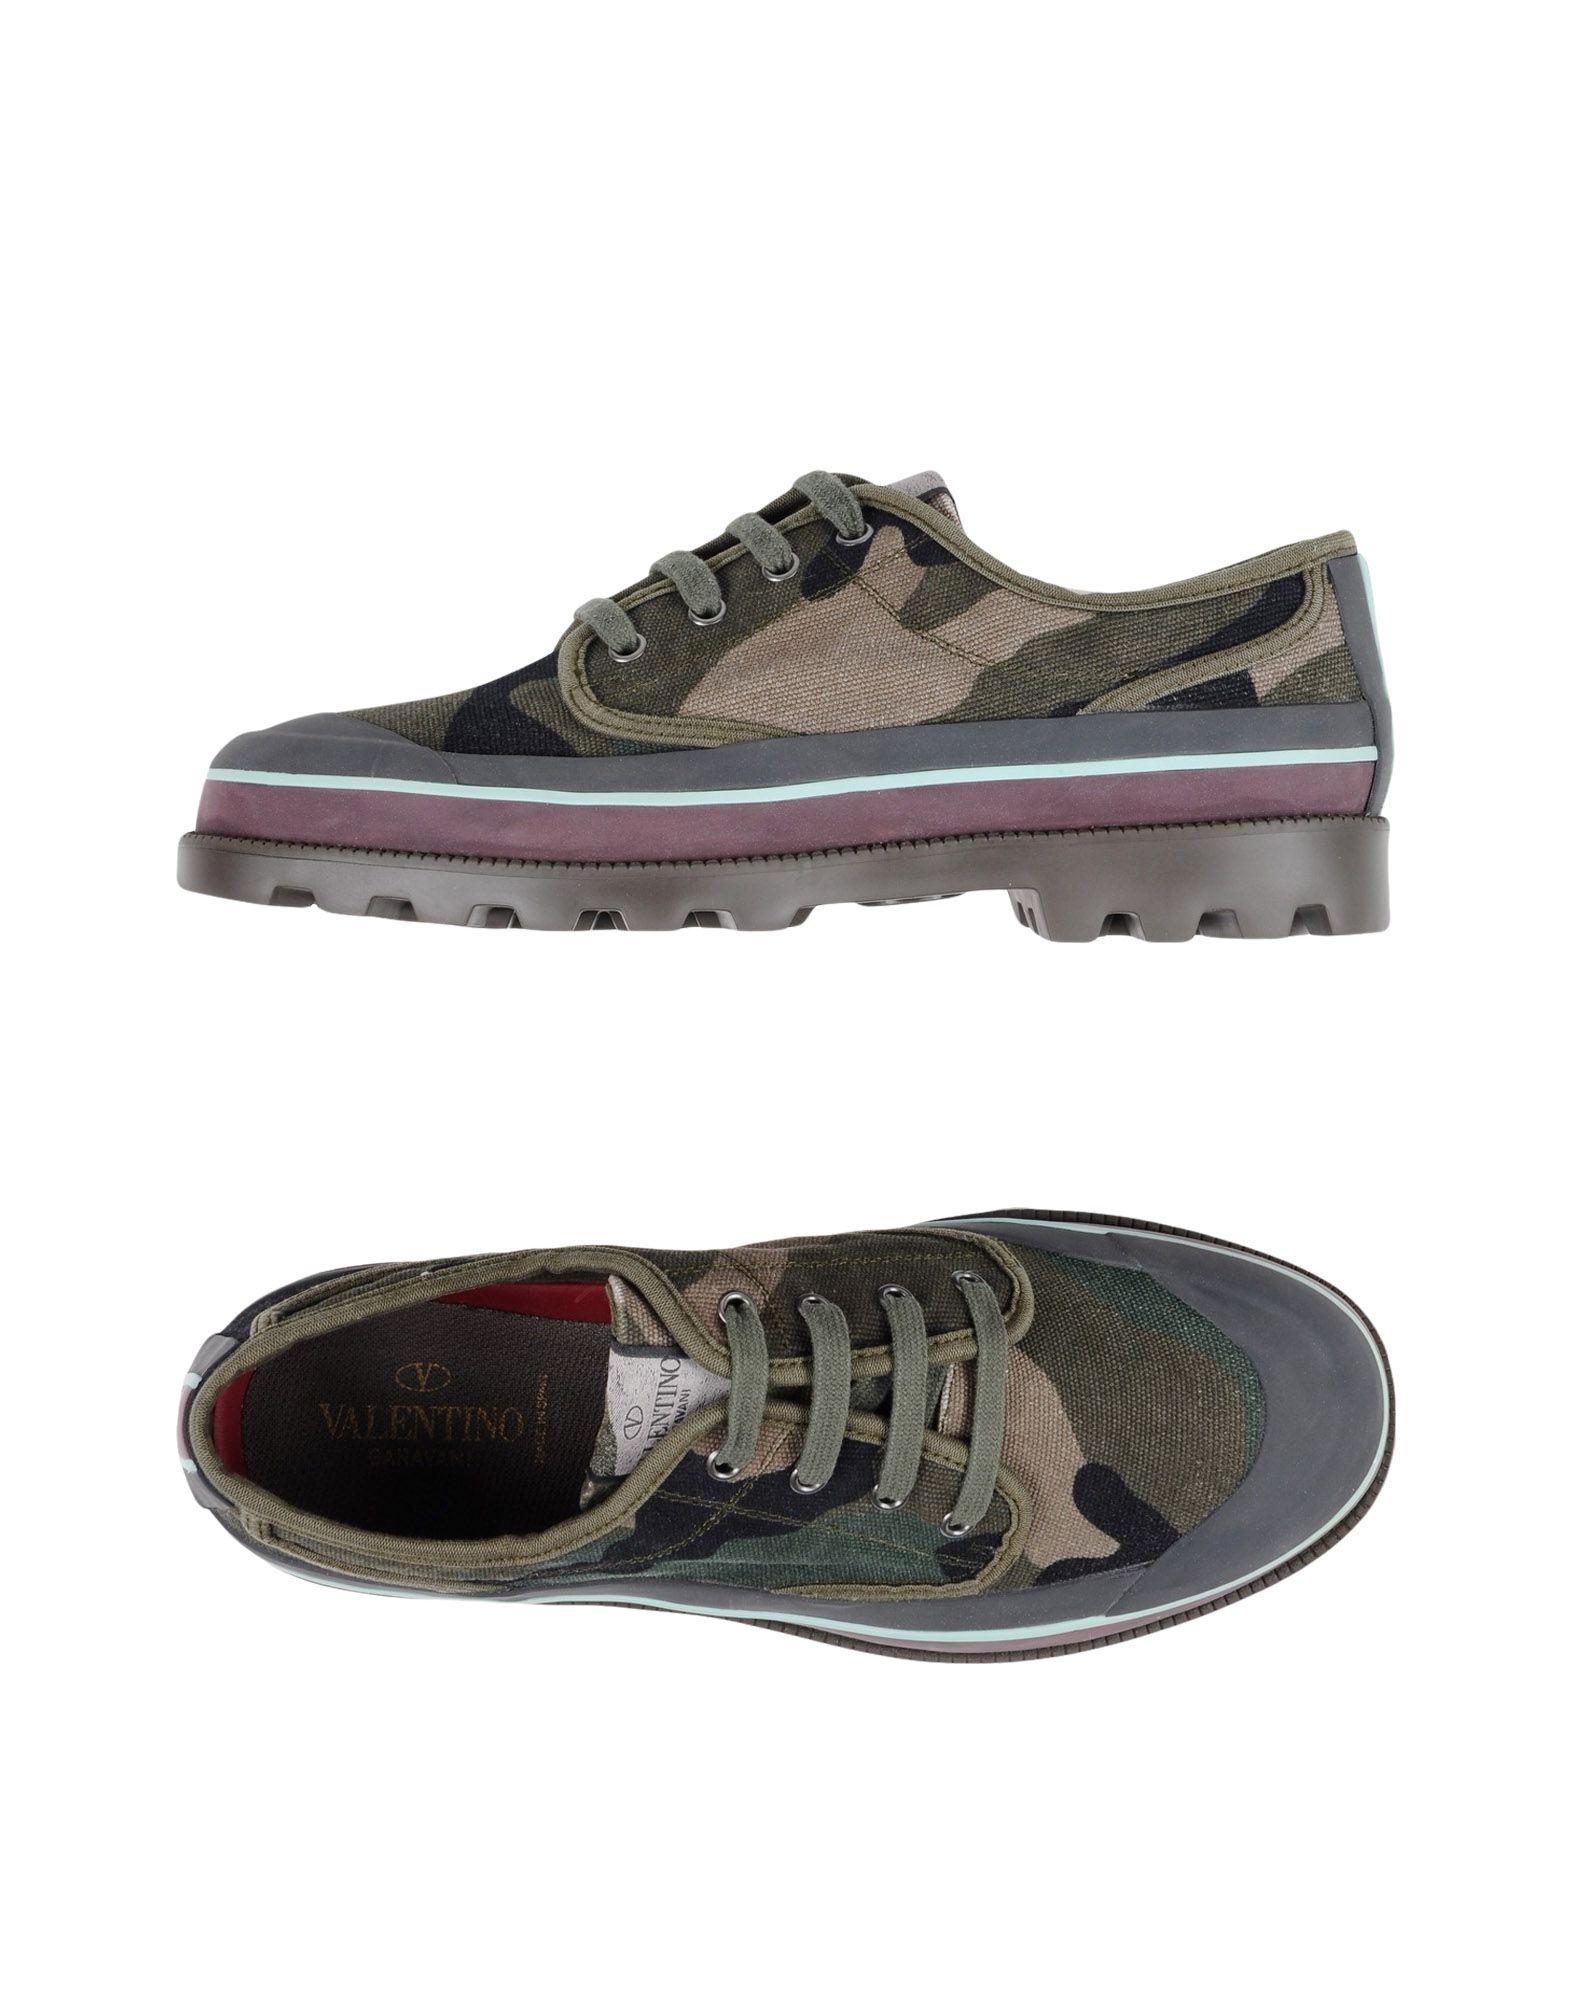 VALENTINO GARAVANI Обувь на шнурках endless обувь на шнурках